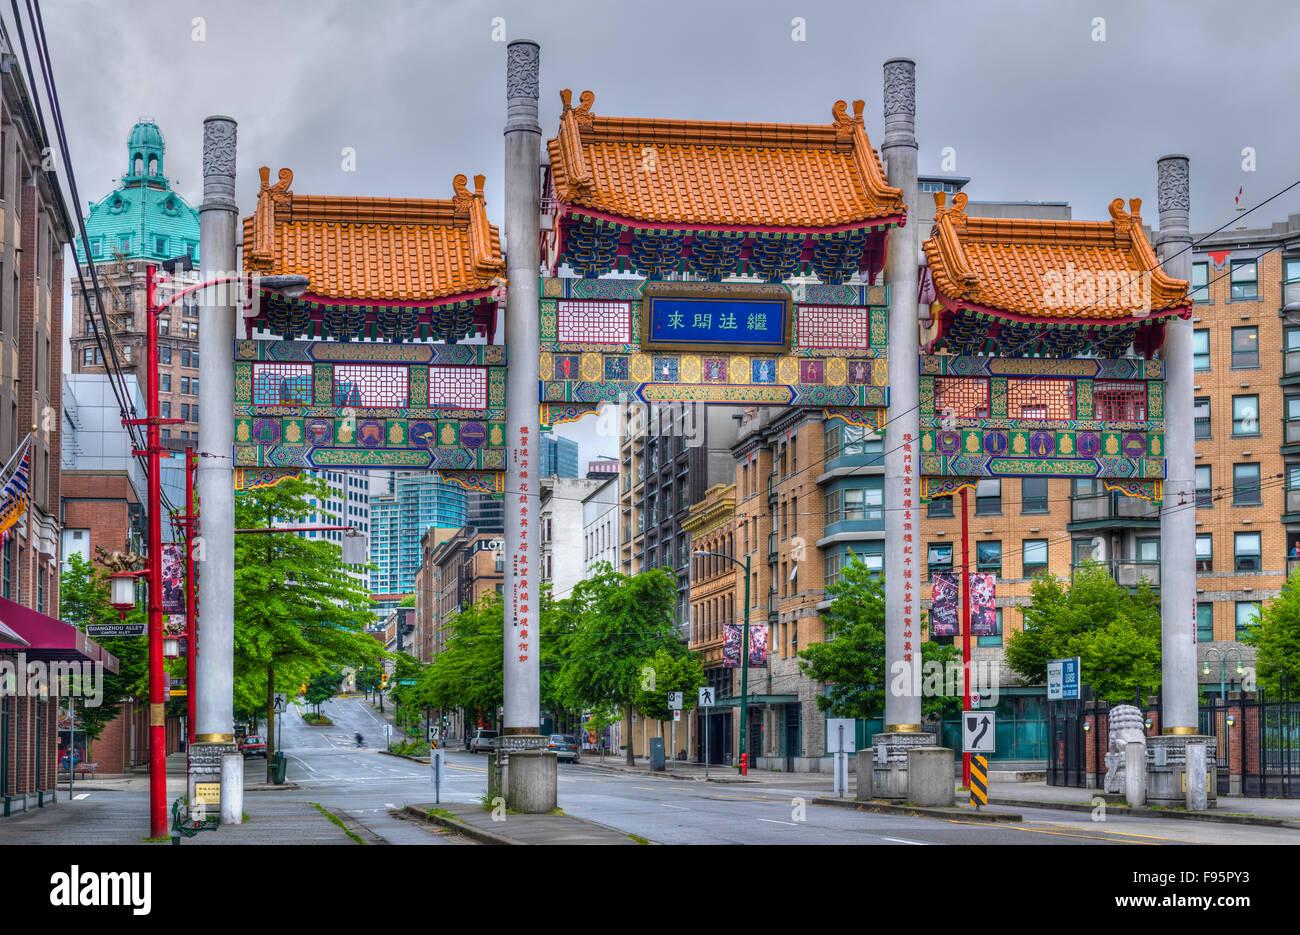 China Town, Vancouver, British Columbia, Canada Stock Photo